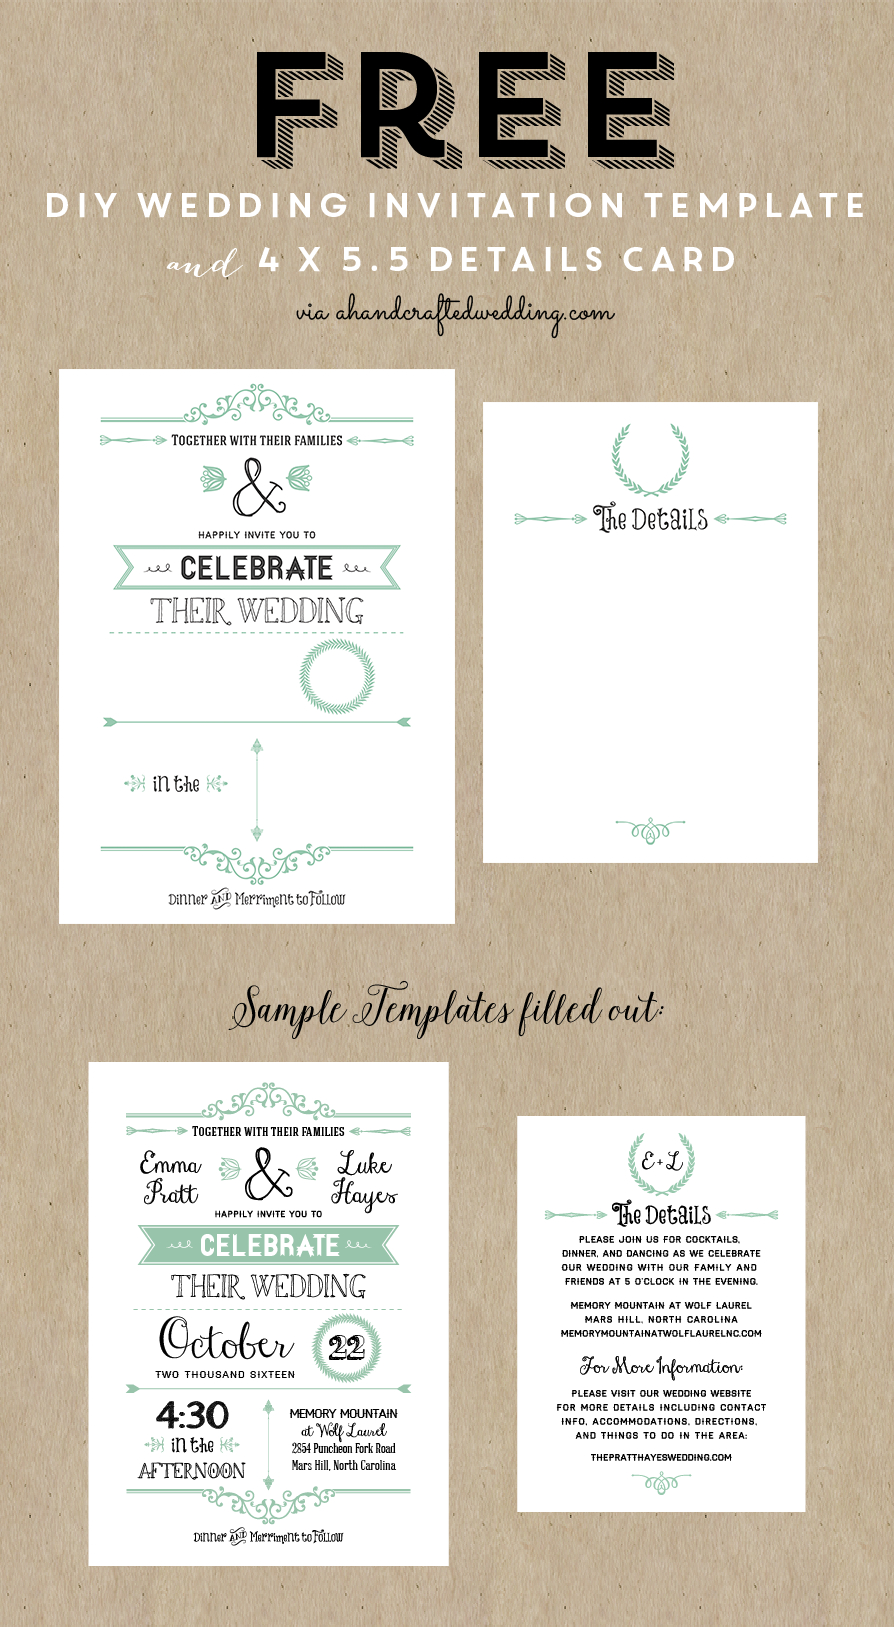 Free Printable Wedding Invitation Template | Wedding | Free Wedding - Free Printable Wedding Invitation Templates